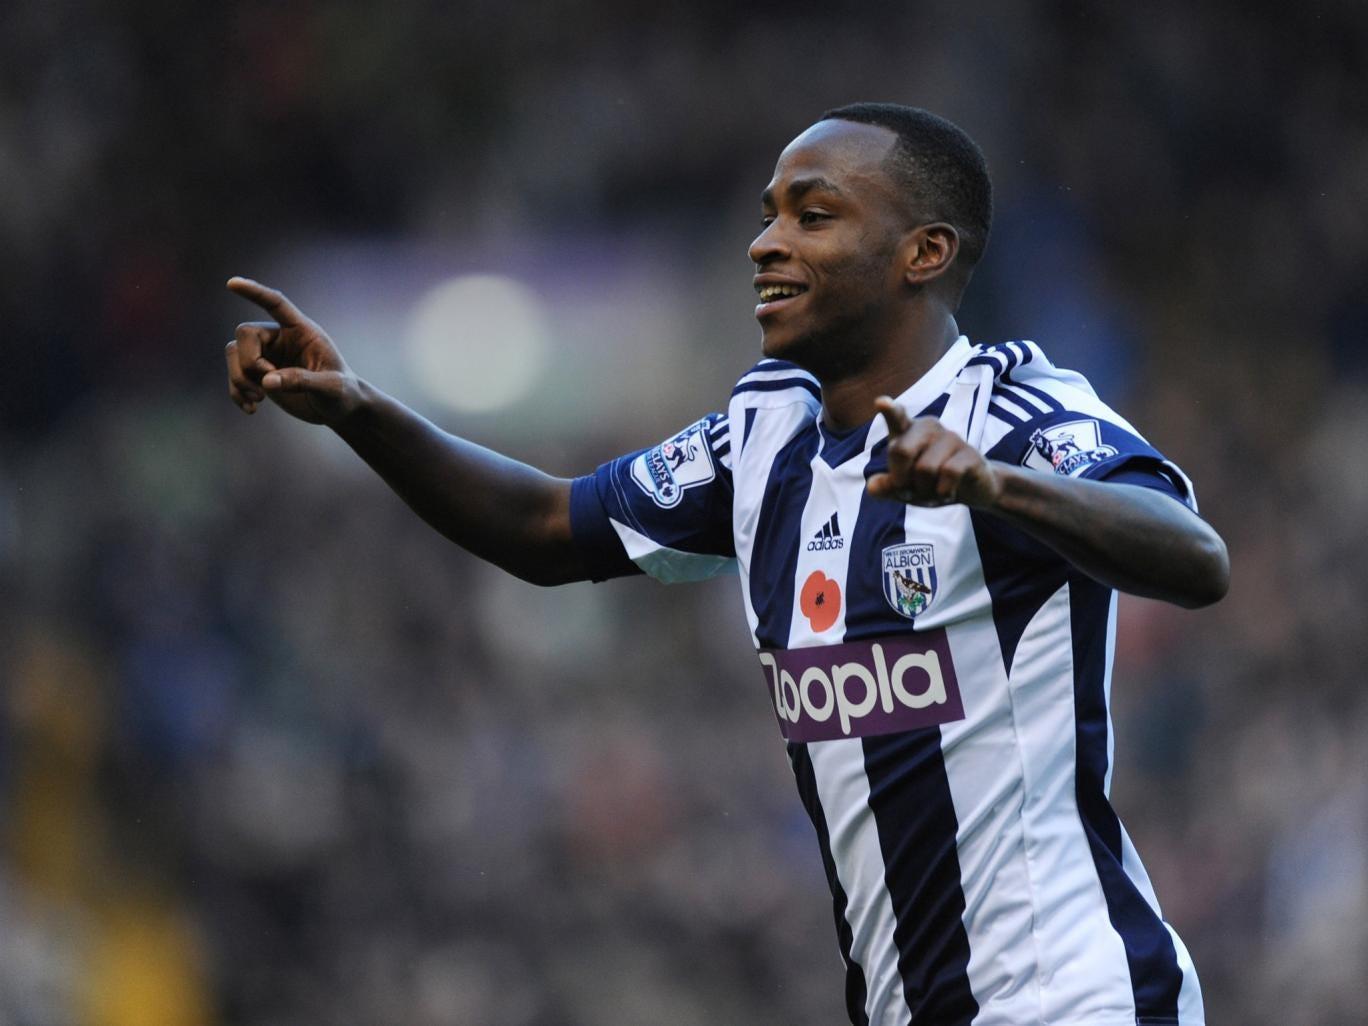 West Brom striker Saido Berahino scored his sixth goal of the season as the Baggies beat Crystal Palace 2-0